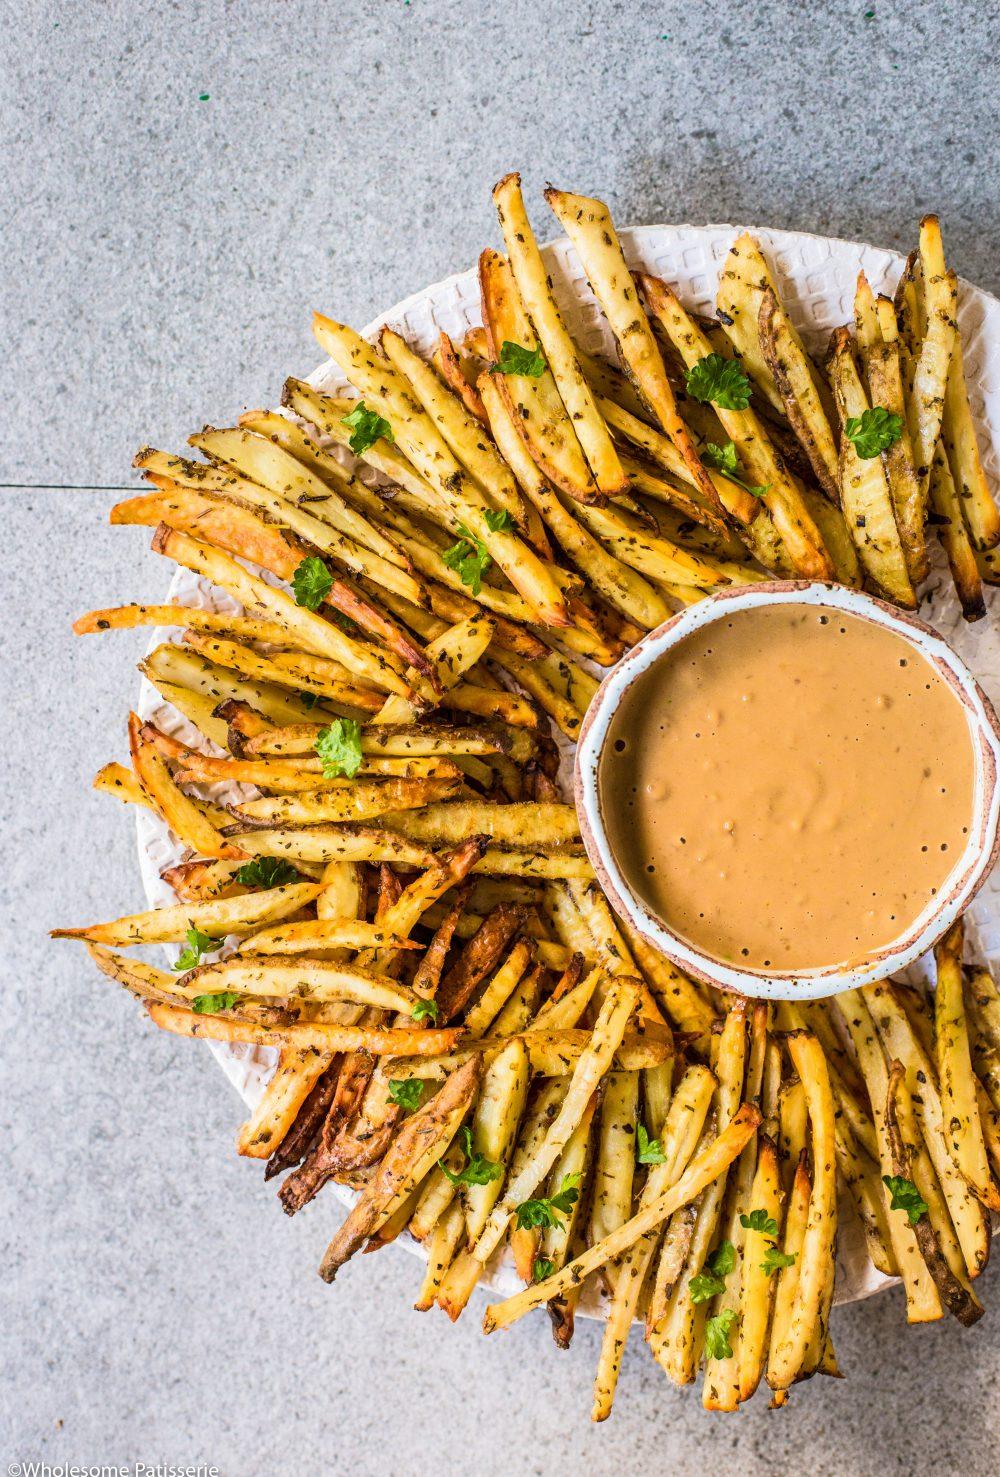 Roasted Herb Fries + Peanut Butter Dip! Crispy oven fries served with an easy peanut butter dip! #fries #peanutbutter #hotchips #lunch